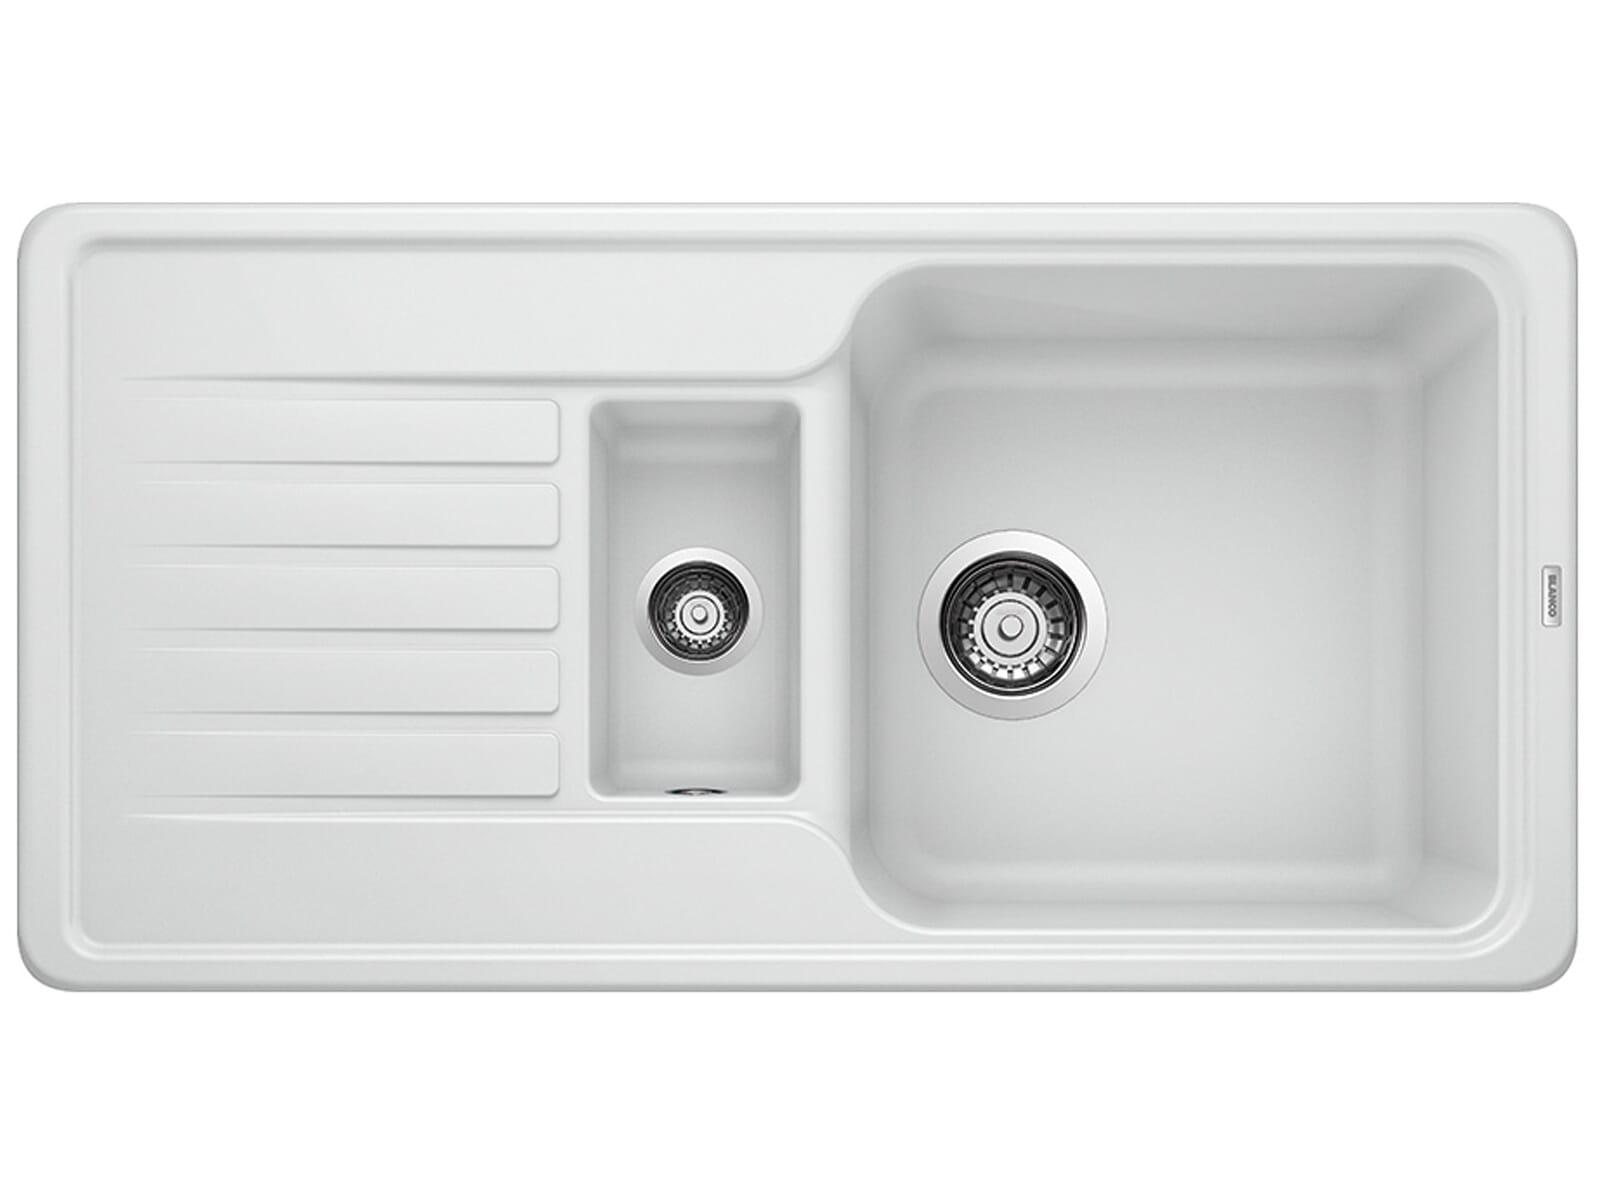 Blanco Favos 6 S Weiß - 521 416 Granitspüle